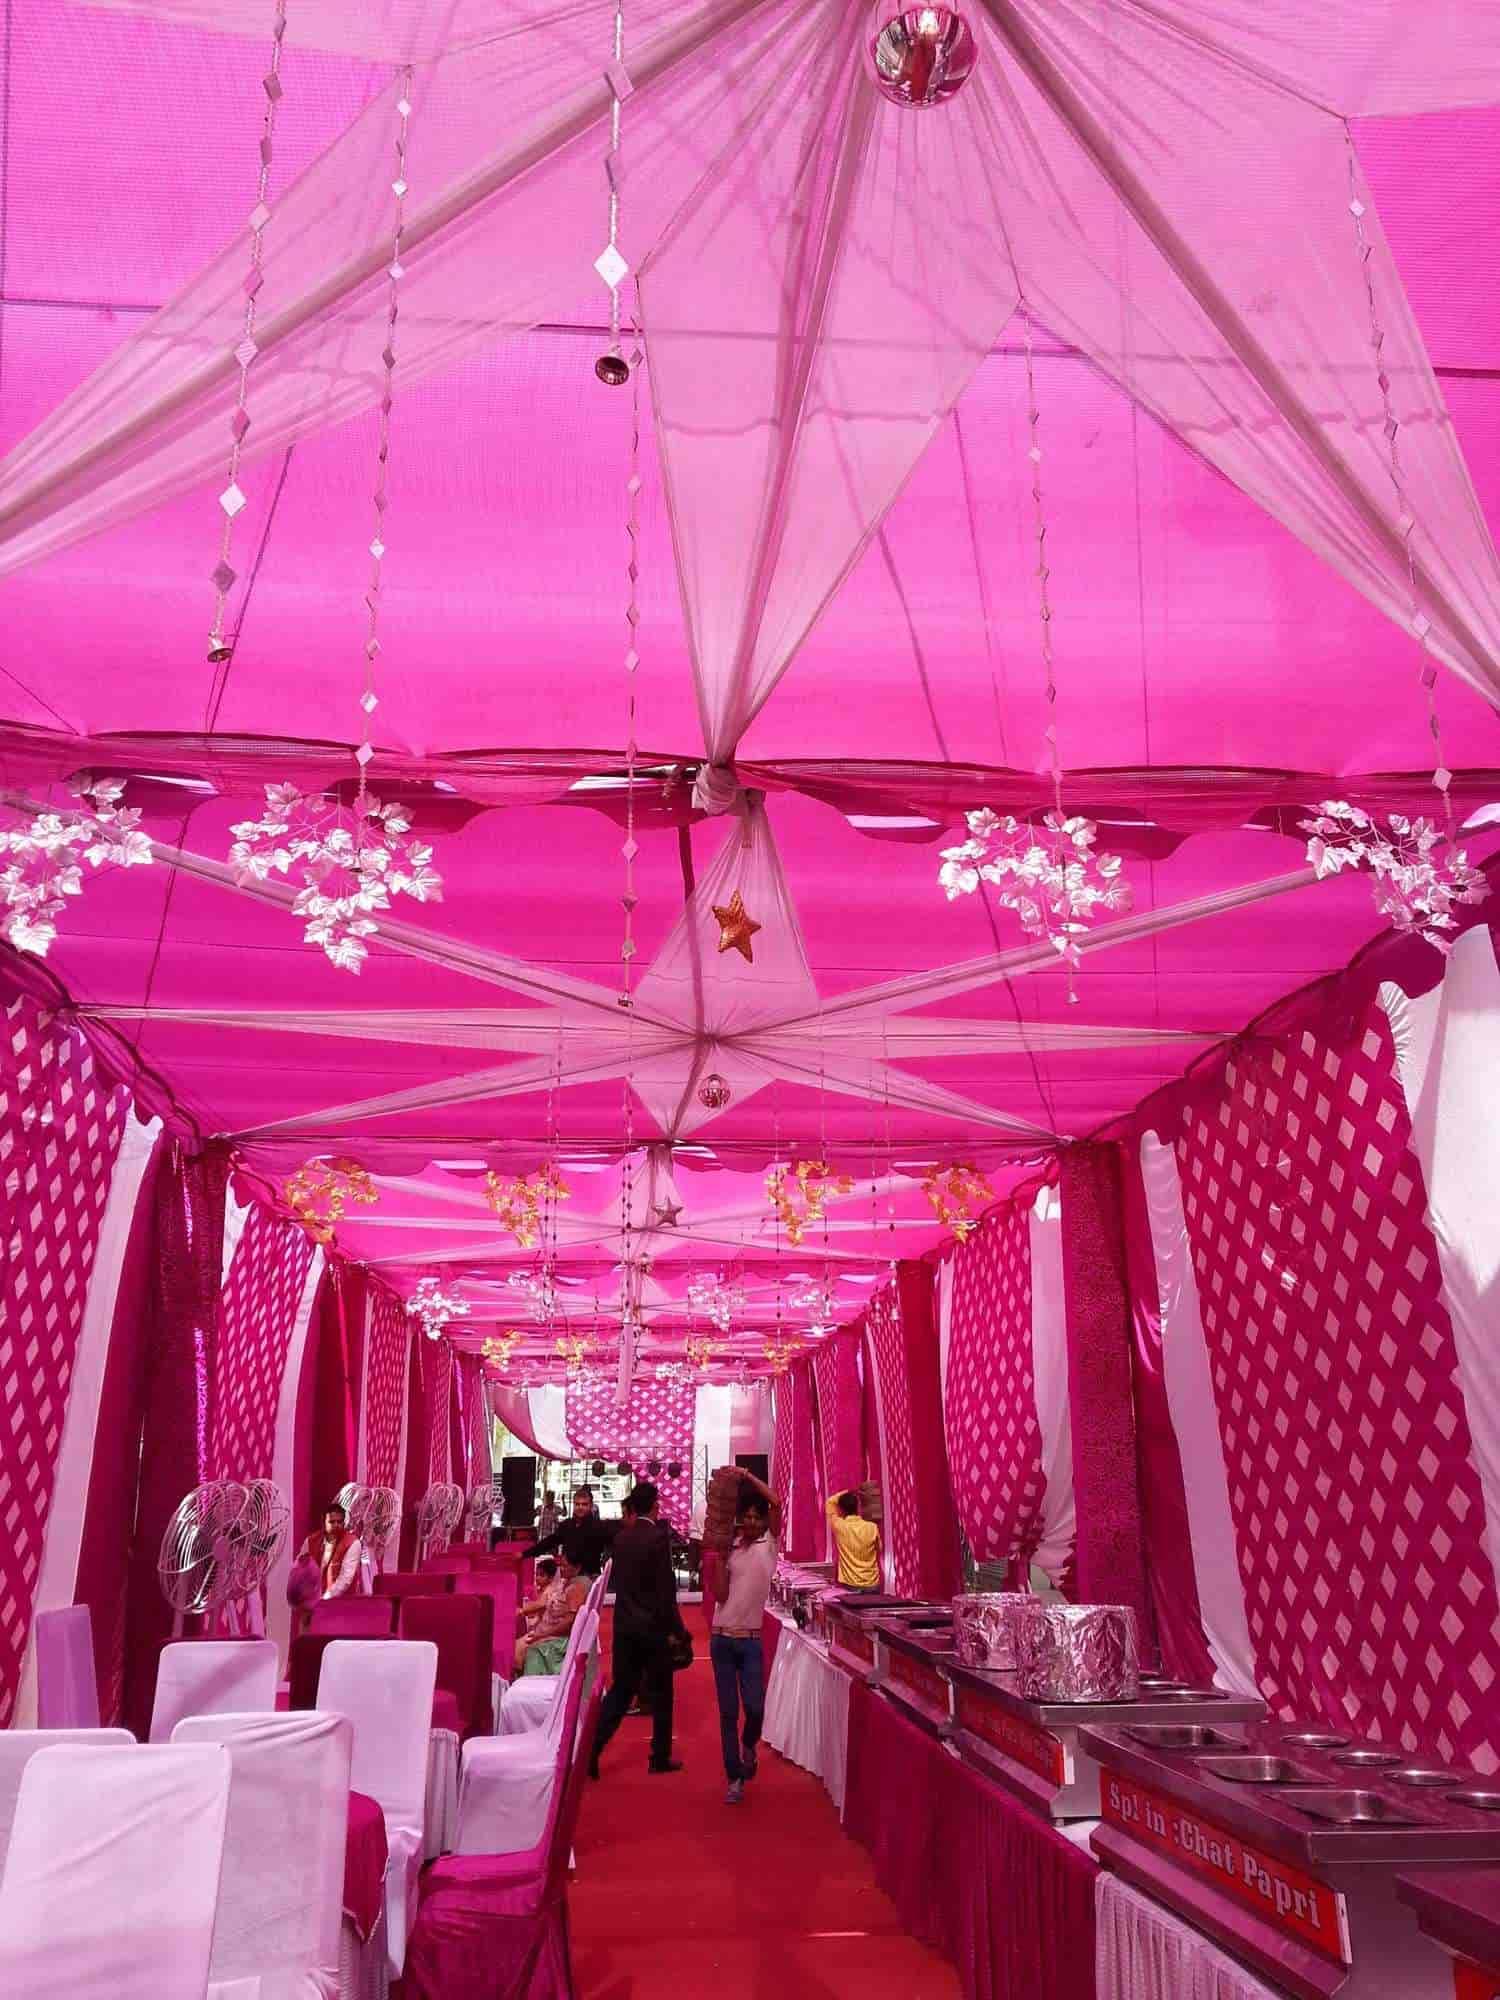 As makkar tent house photos haibowal kalan ludhiana pictures wedding tent decoration as makkar tent house photos haibowal kalan ludhiana tent junglespirit Choice Image